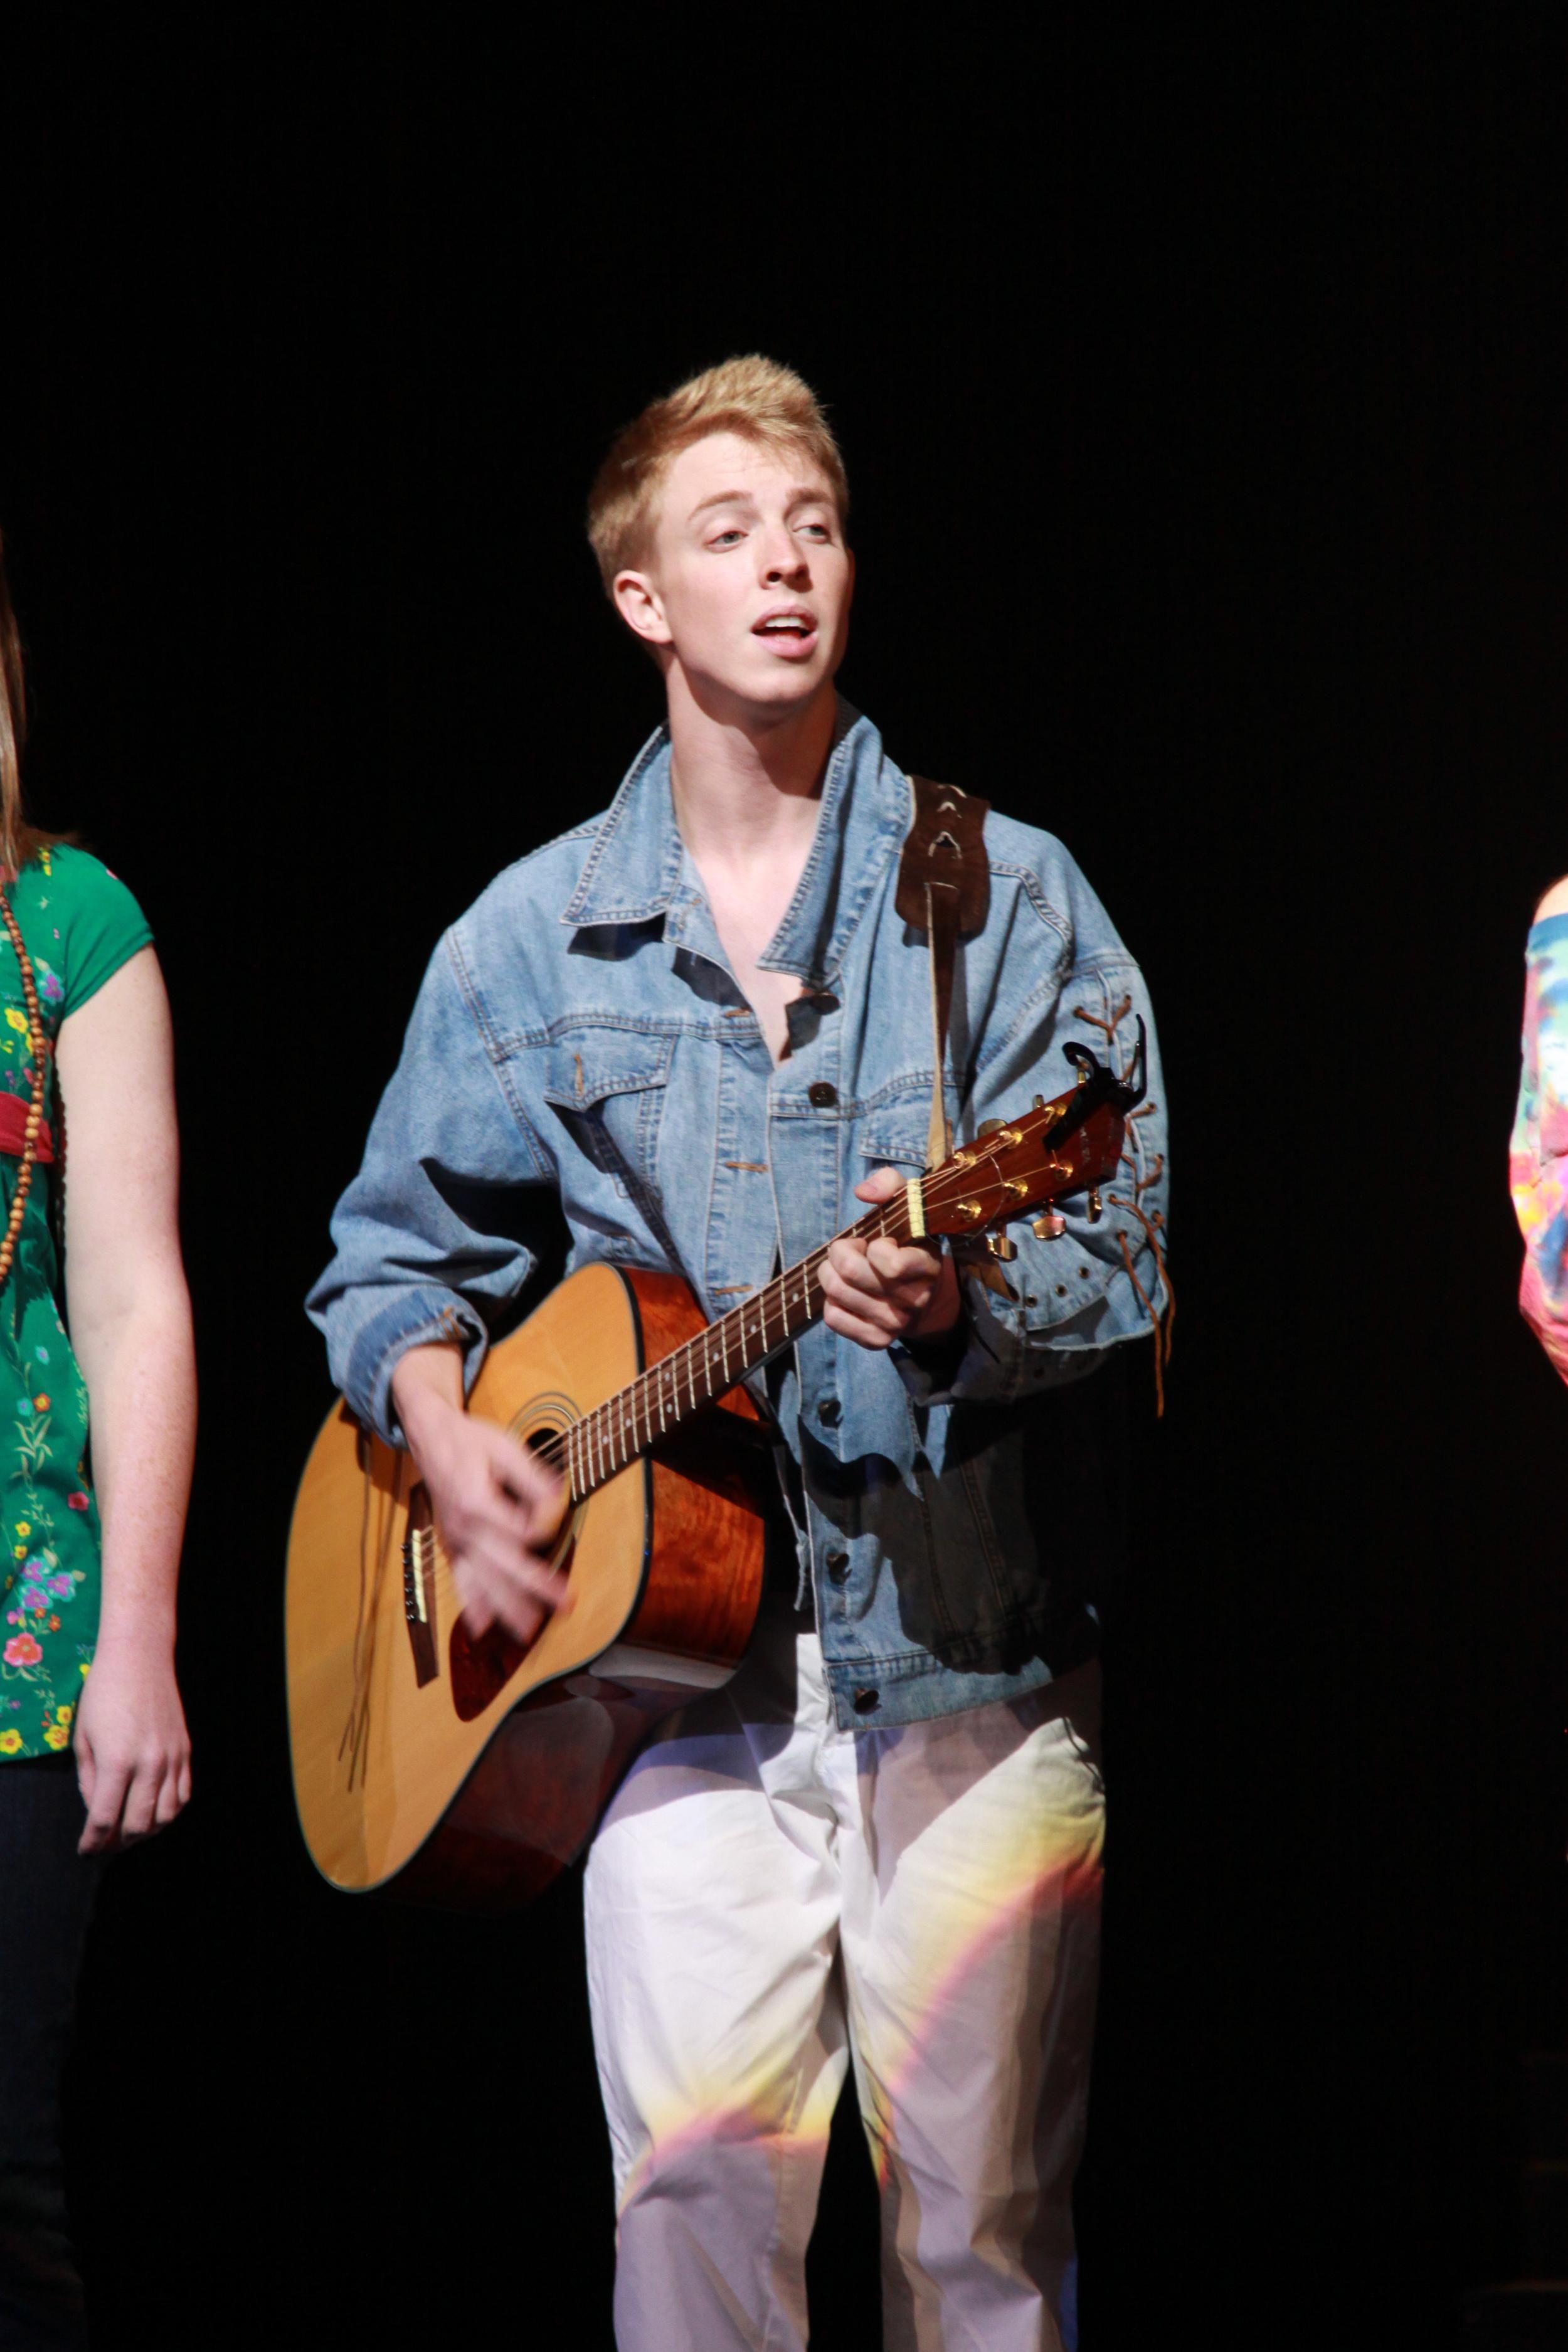 Performing at a Broadway Dreams event at the Cobb Energy Center in Atlanta, GA.